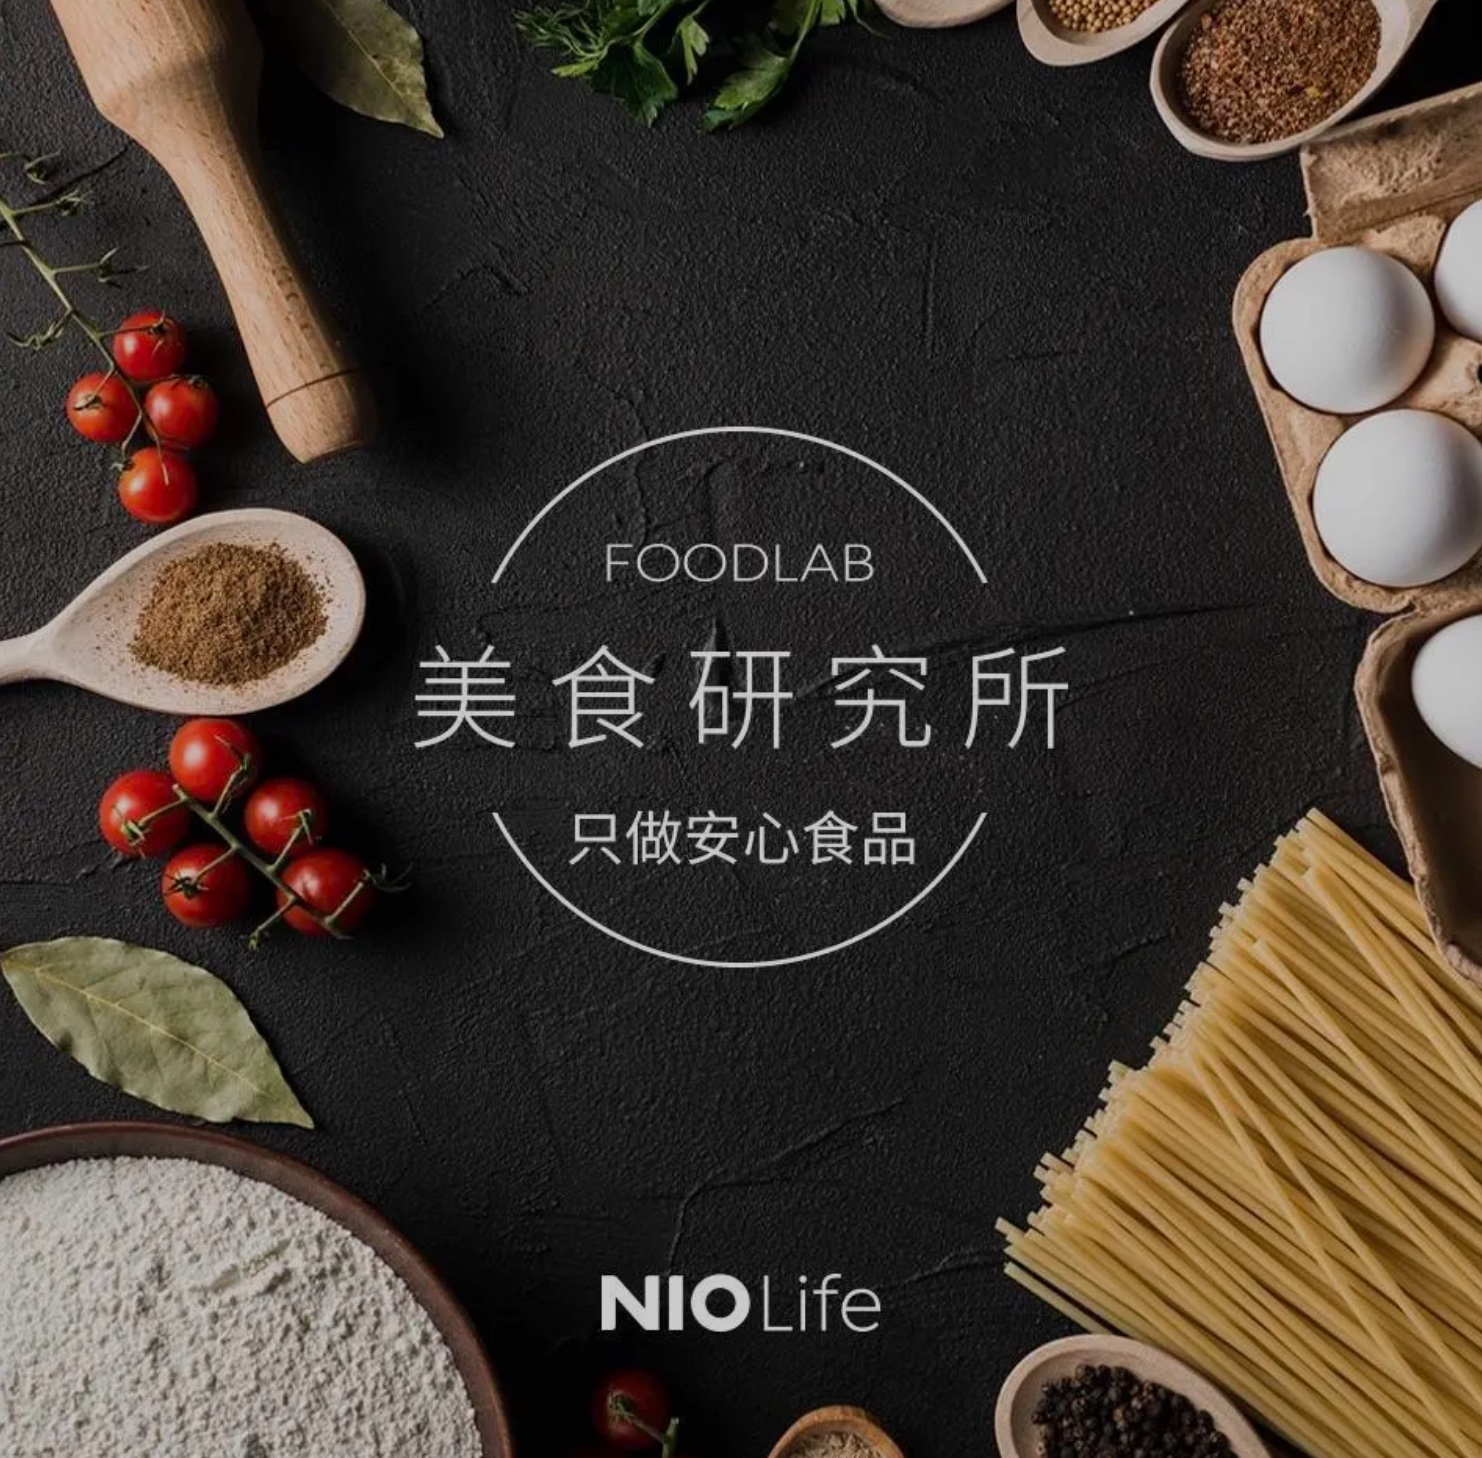 NIO Life establishes food research institute FoodLab-cnTechPost